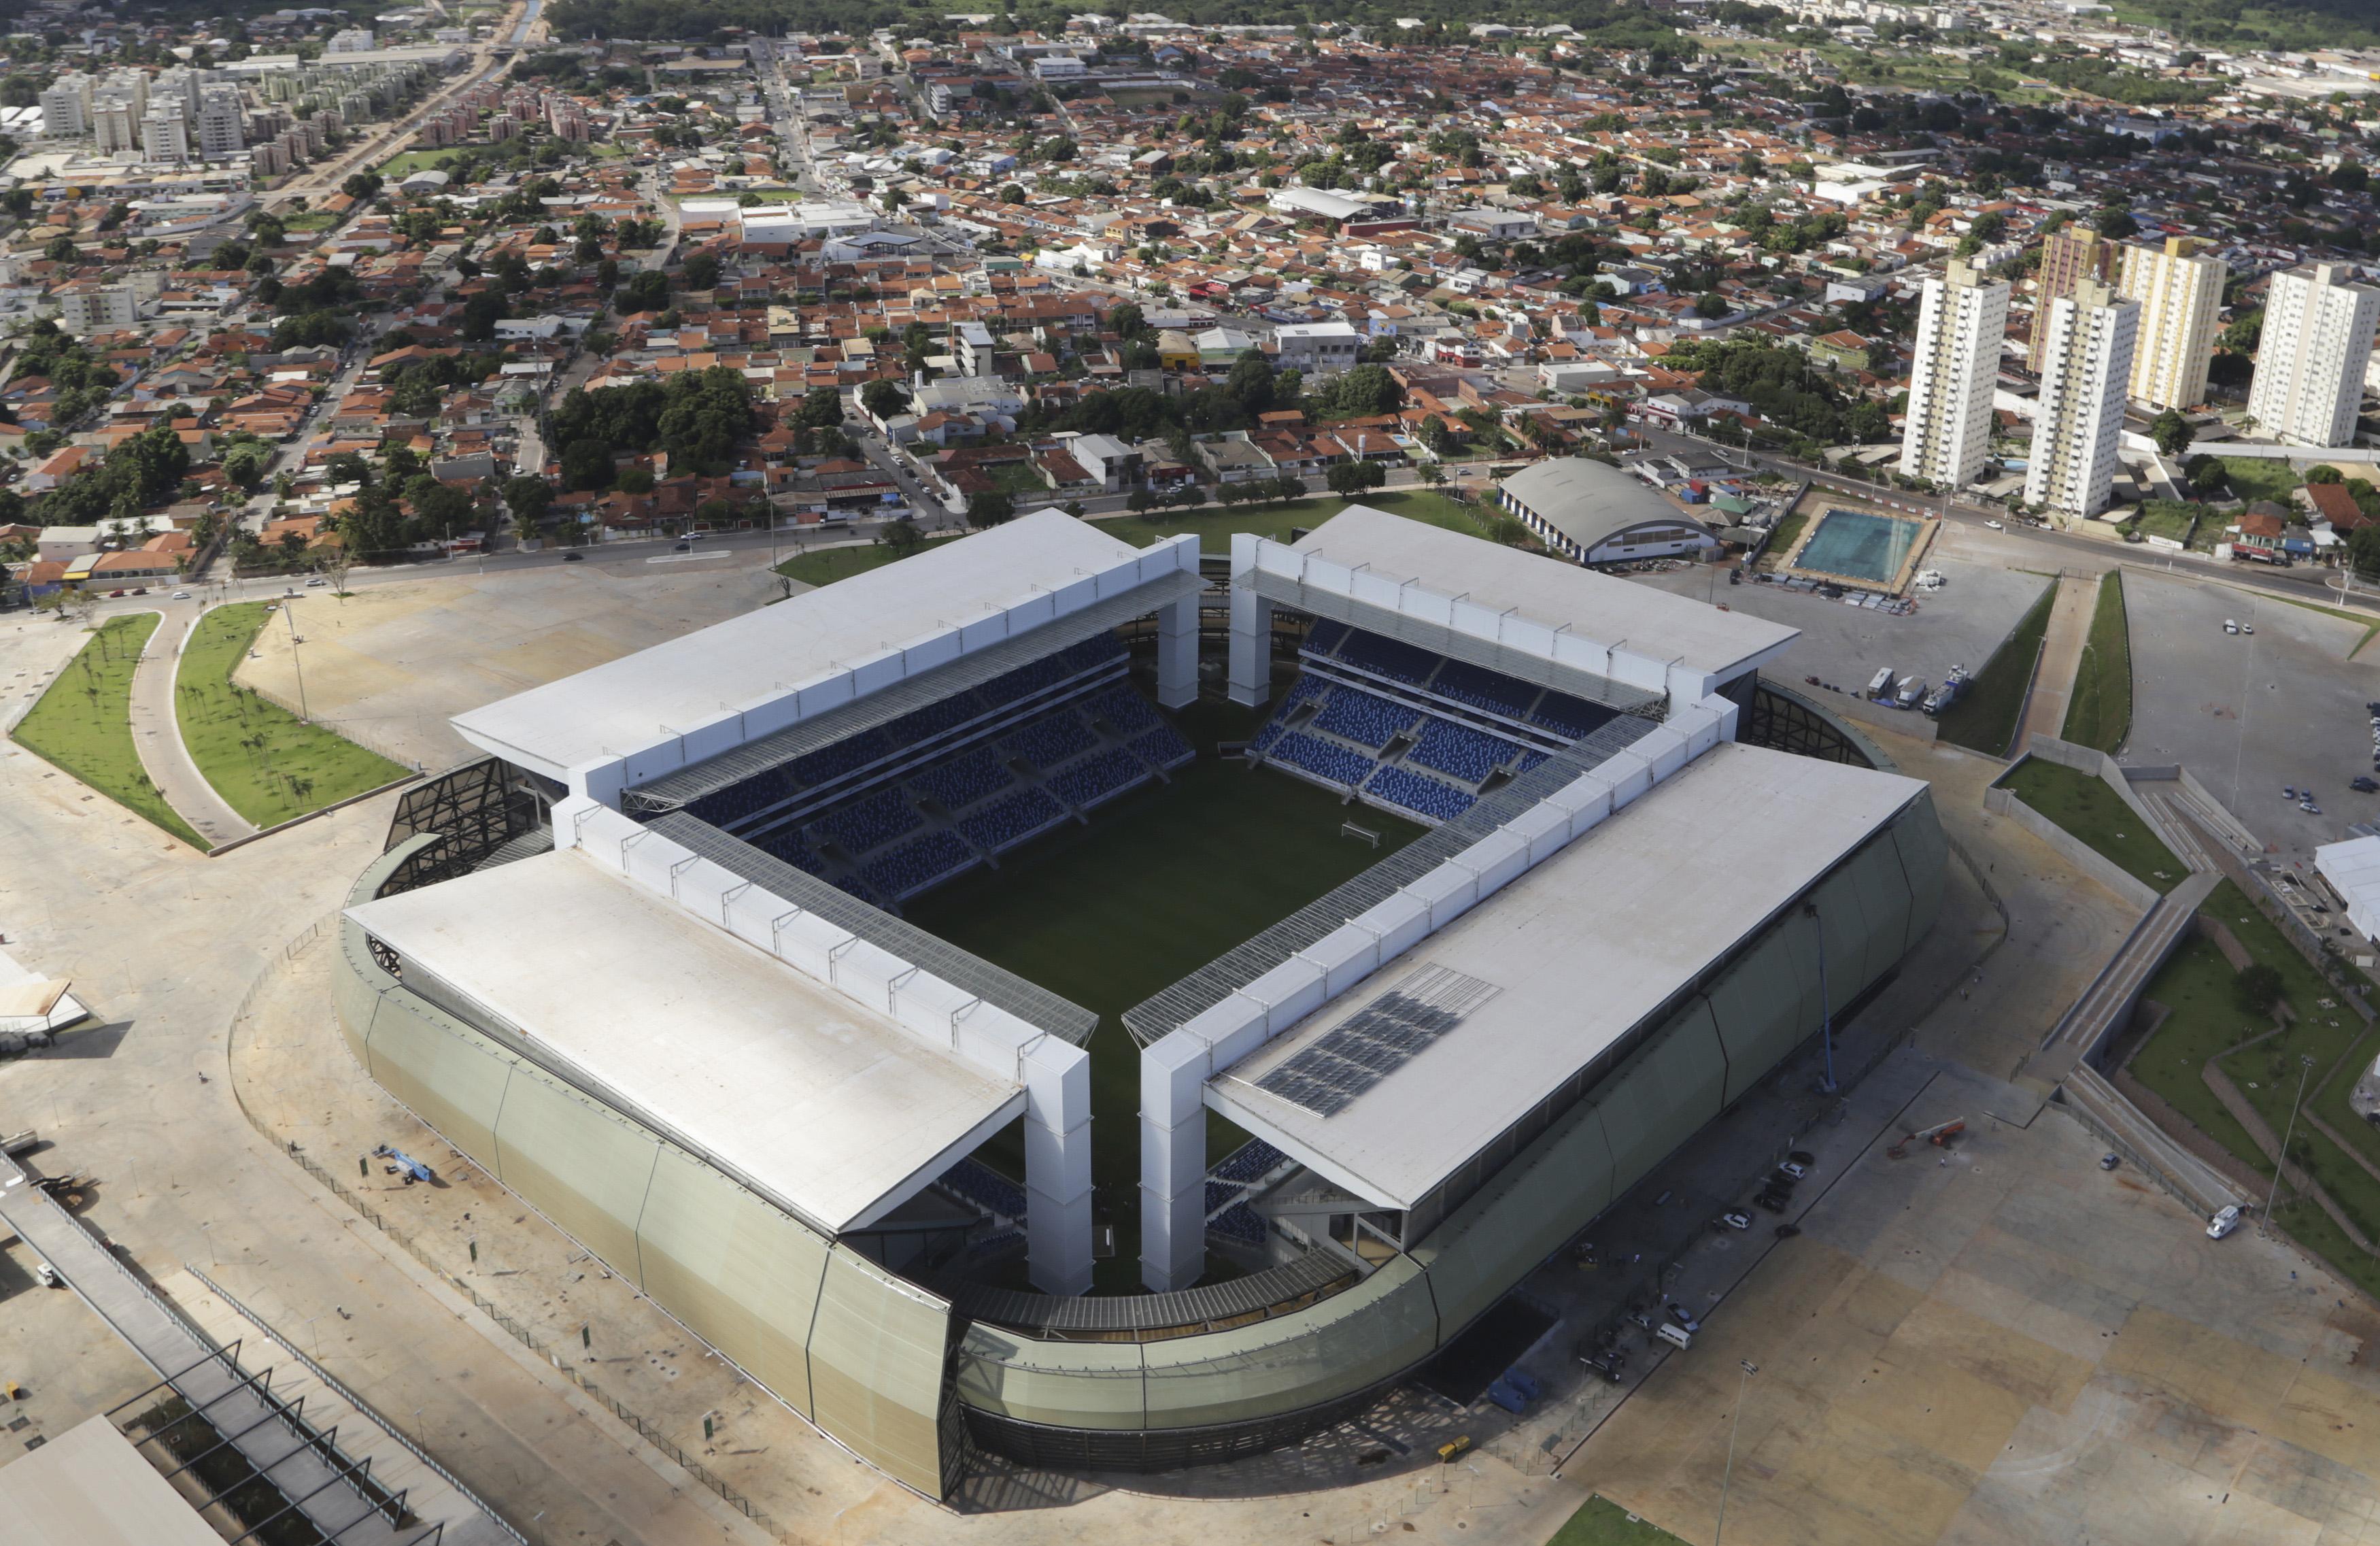 Arena Patanal                                                              City: Ciuaba                                                              Constructed: 2014                                                              Capacity: 40,000